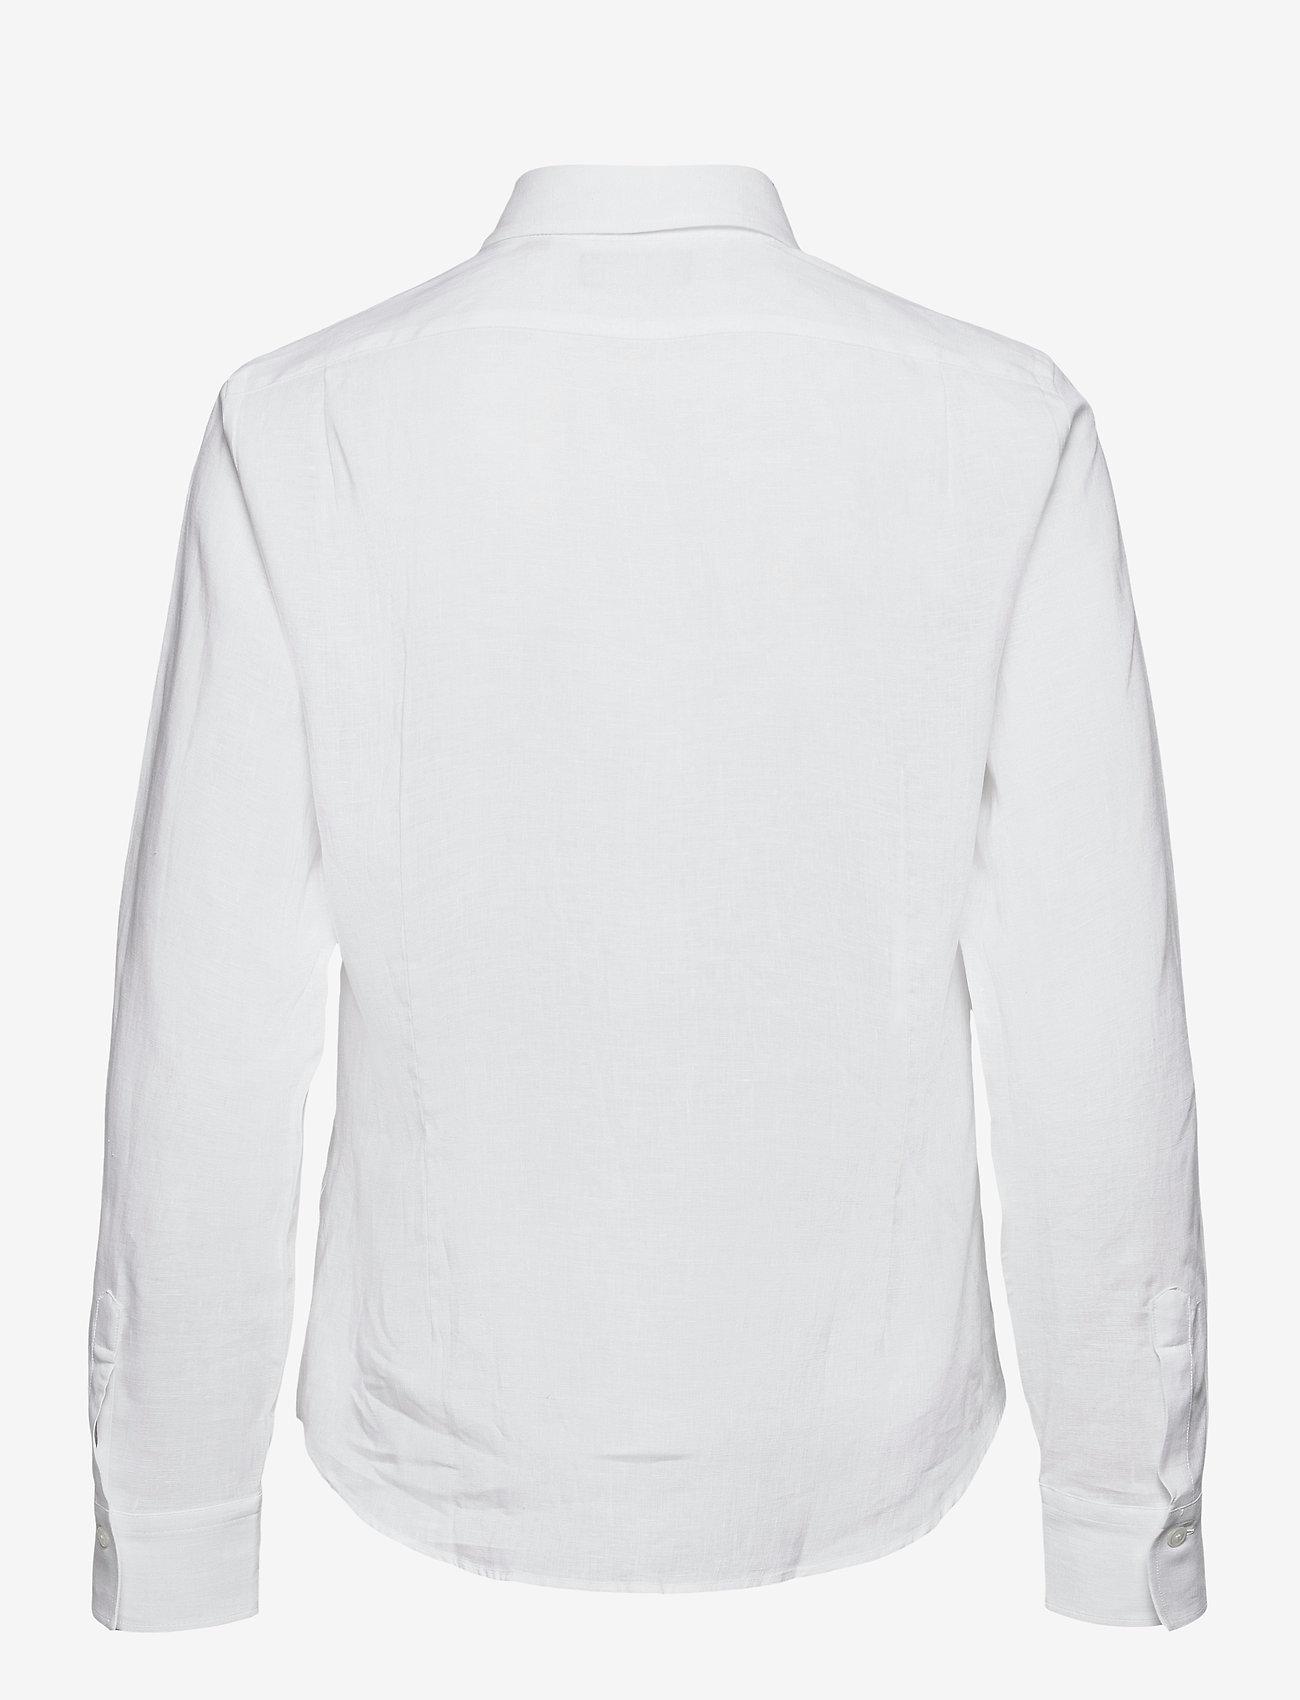 SAND - 8727 W - Sandie New - overhemden met lange mouwen - optical white - 1